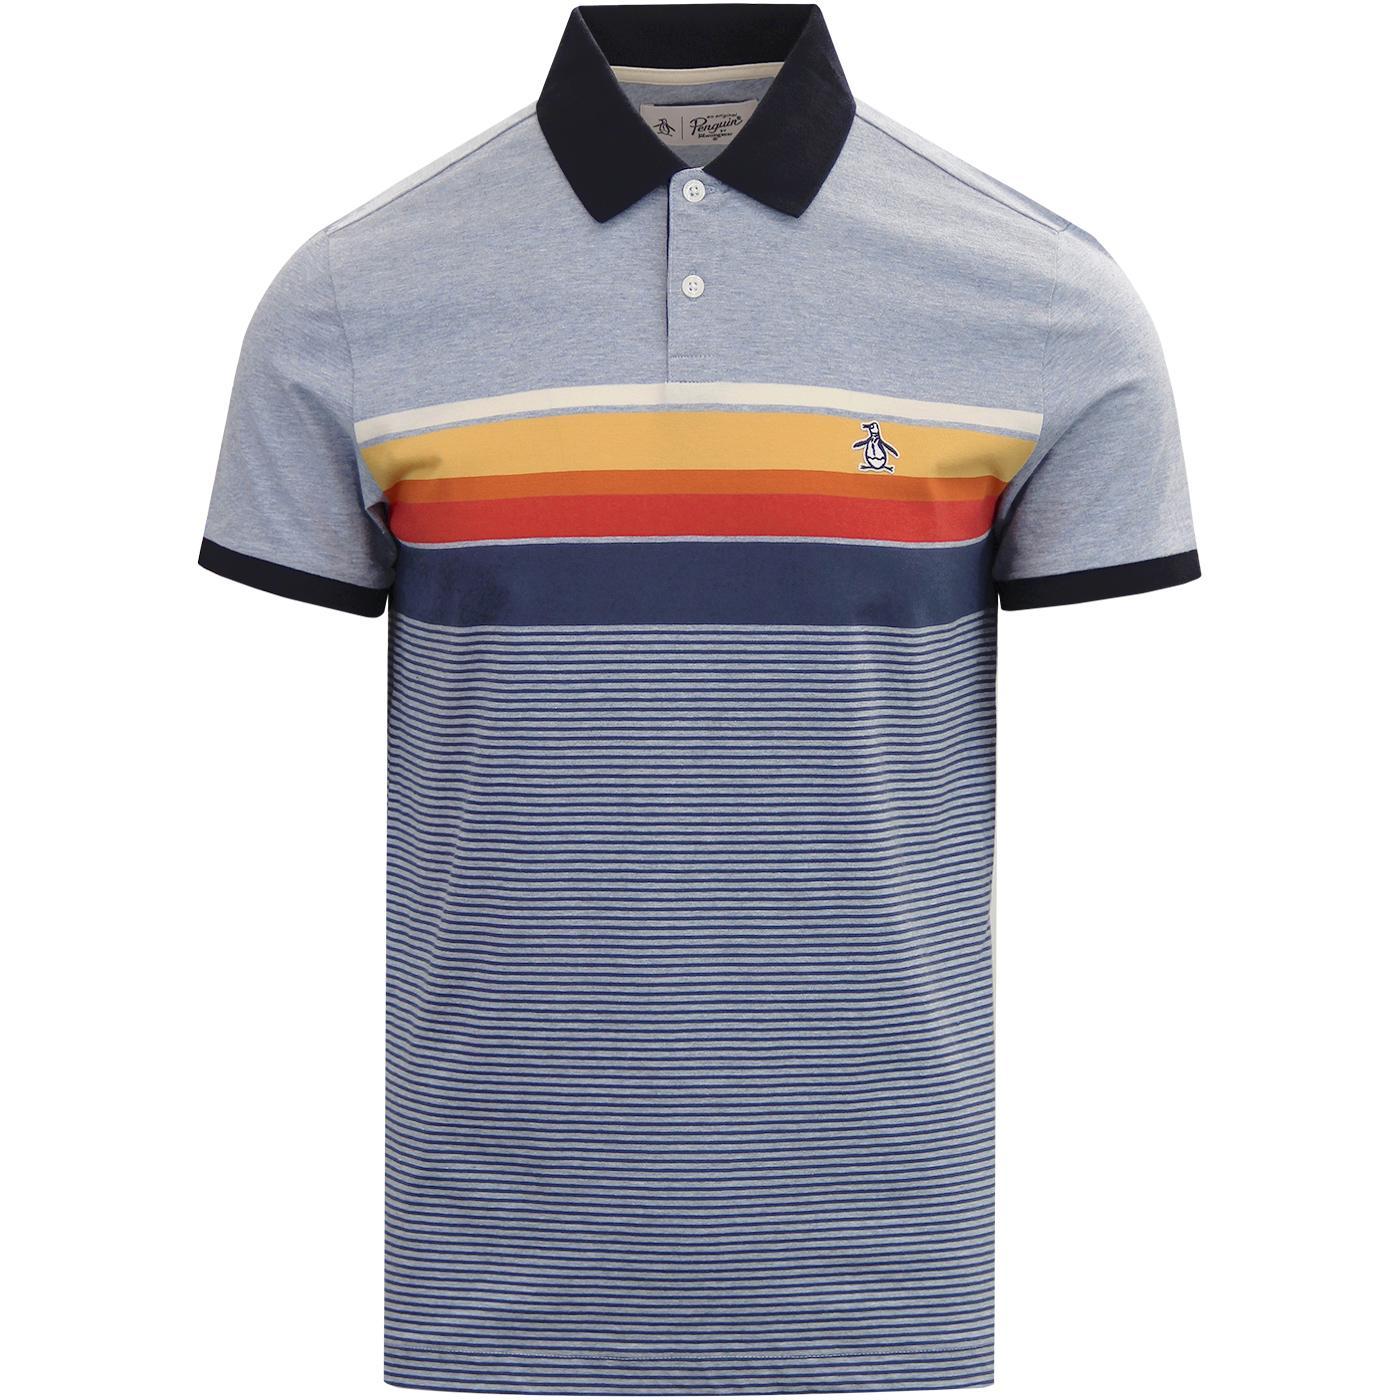 ORIGINAL PENGUIN Mod Engineered Stripe Jersey Polo